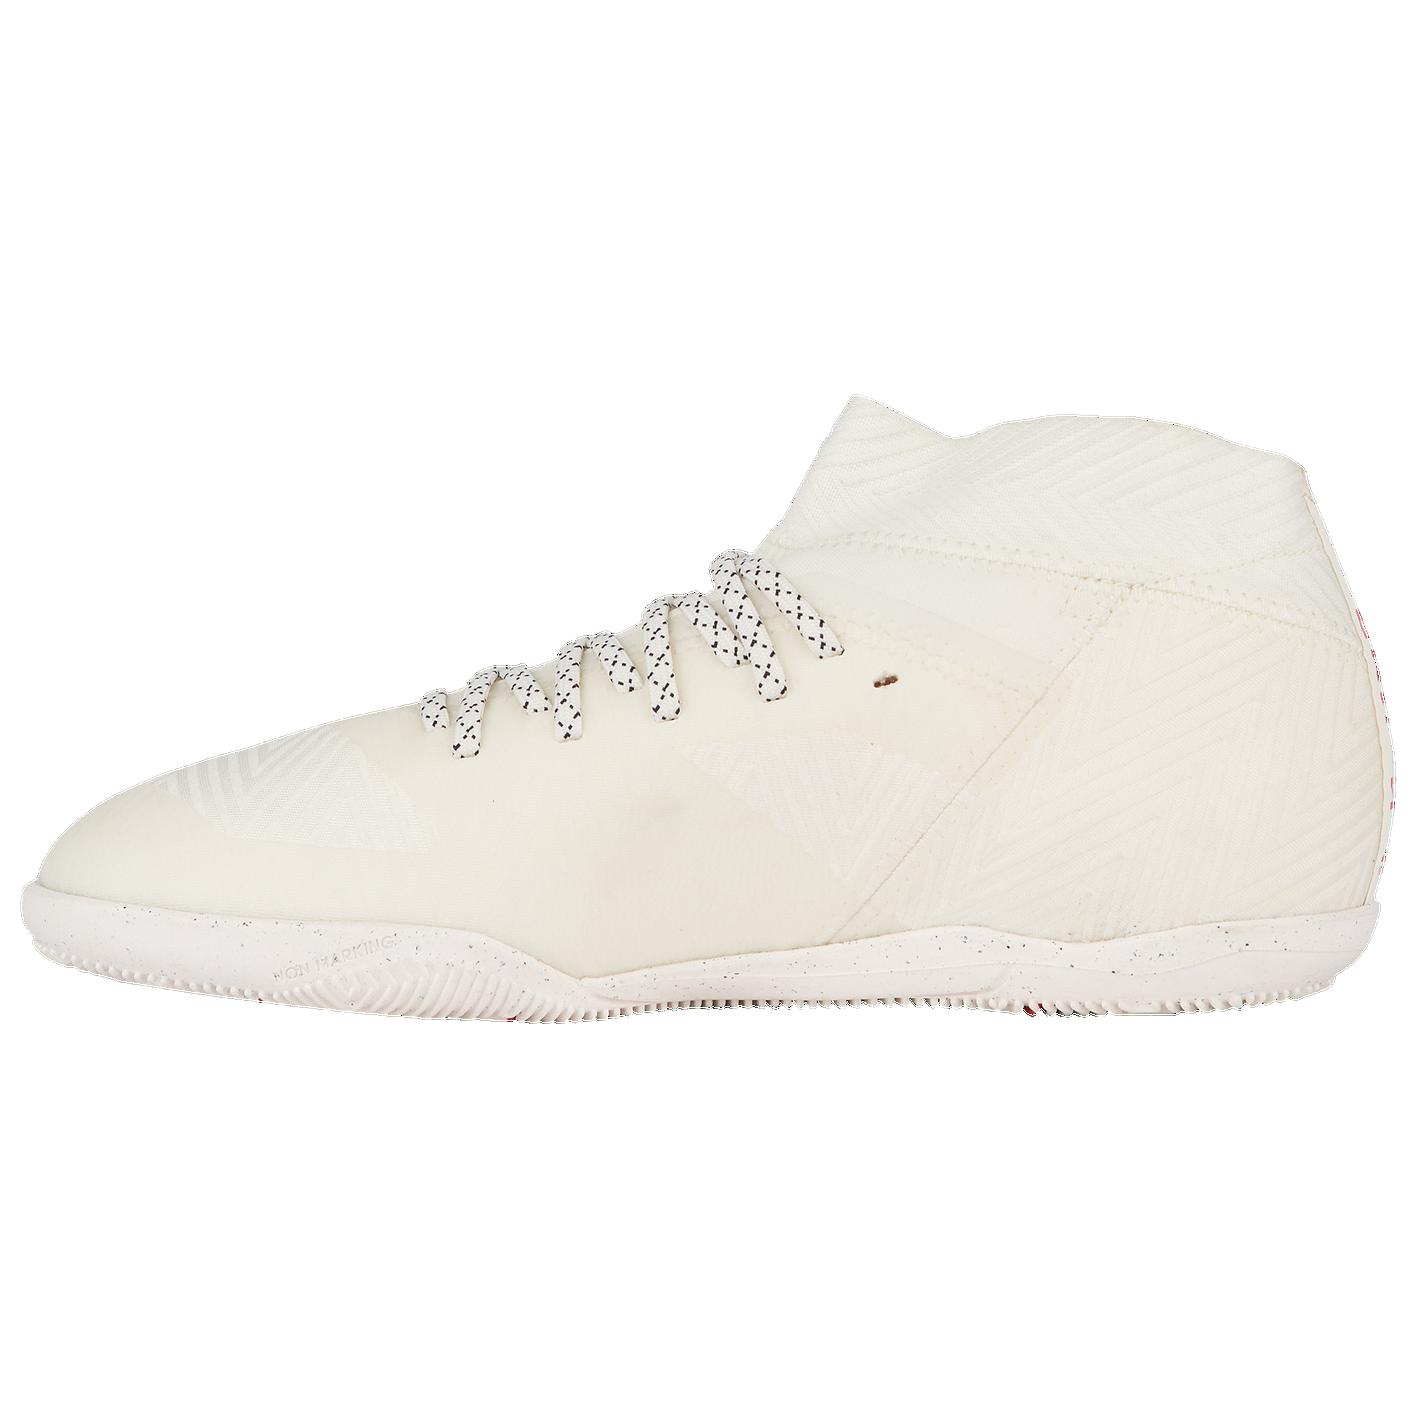 5818b0d5c82 adidas Nemeziz Tango 18.3 IN - Boys  Grade School - Soccer - Shoes ...